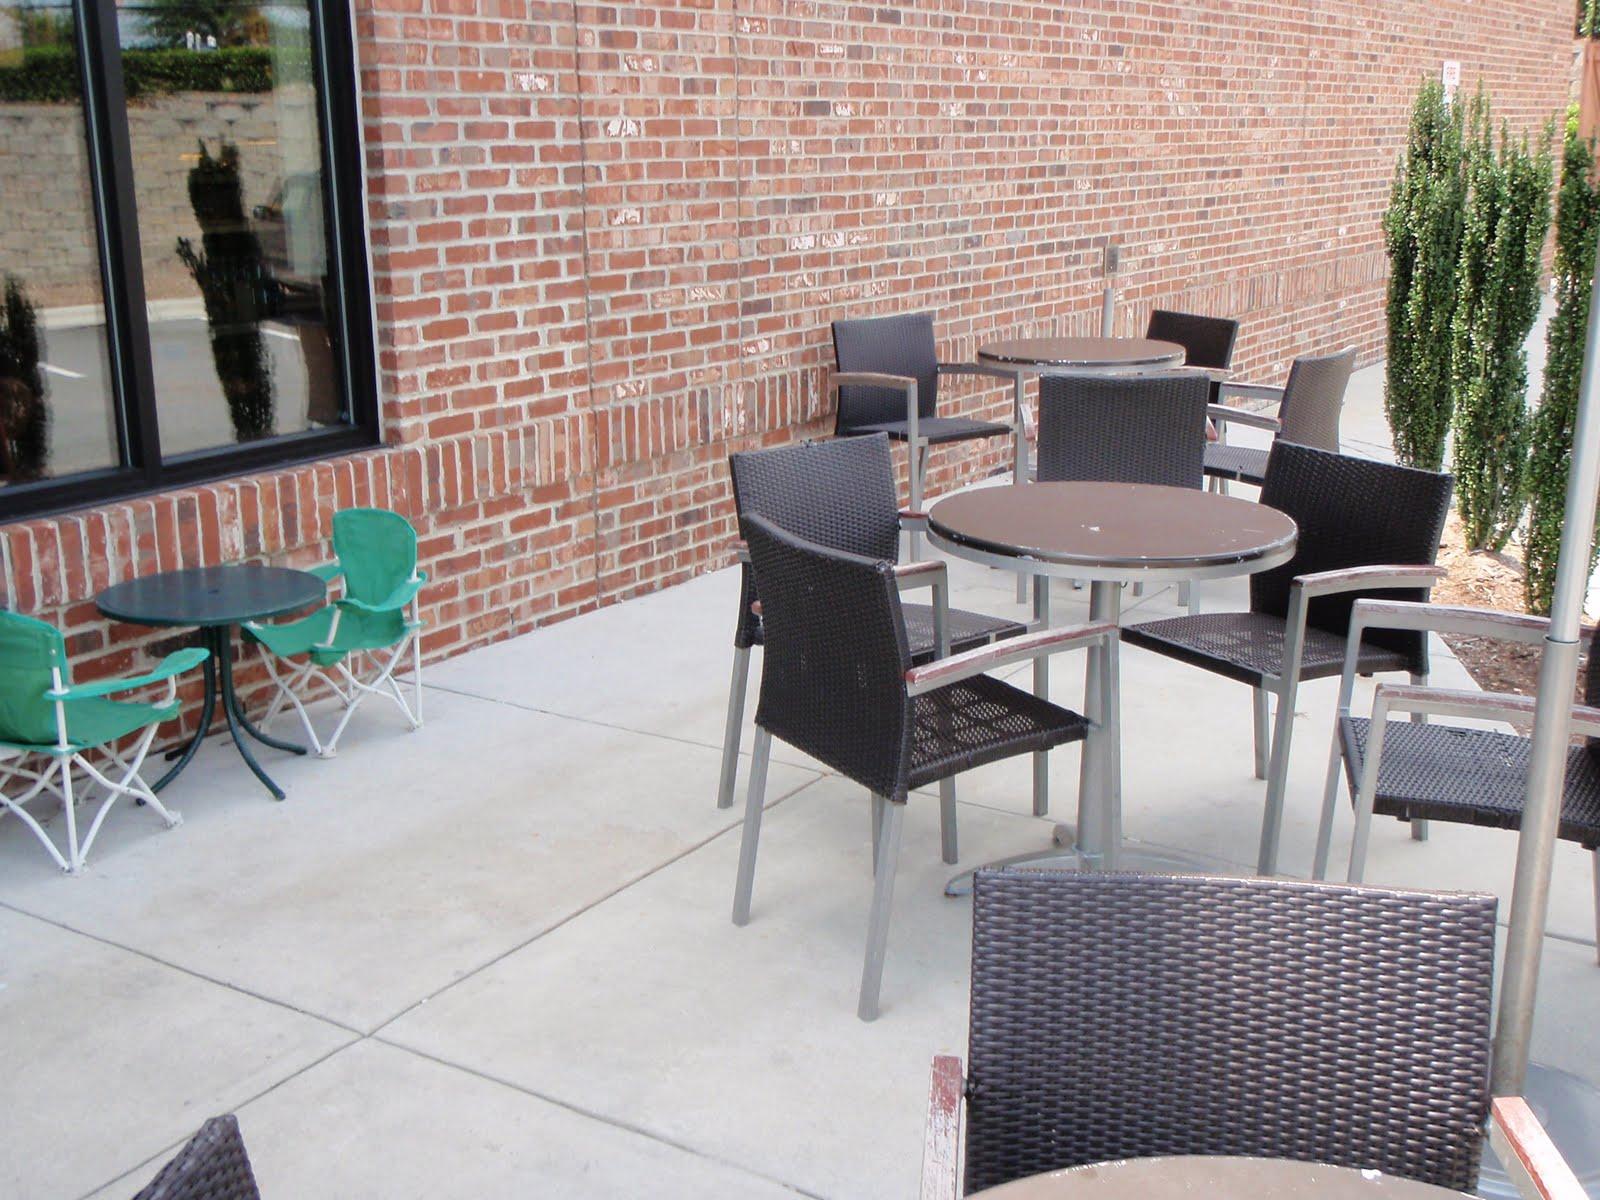 Starbucks at New Hope Commons